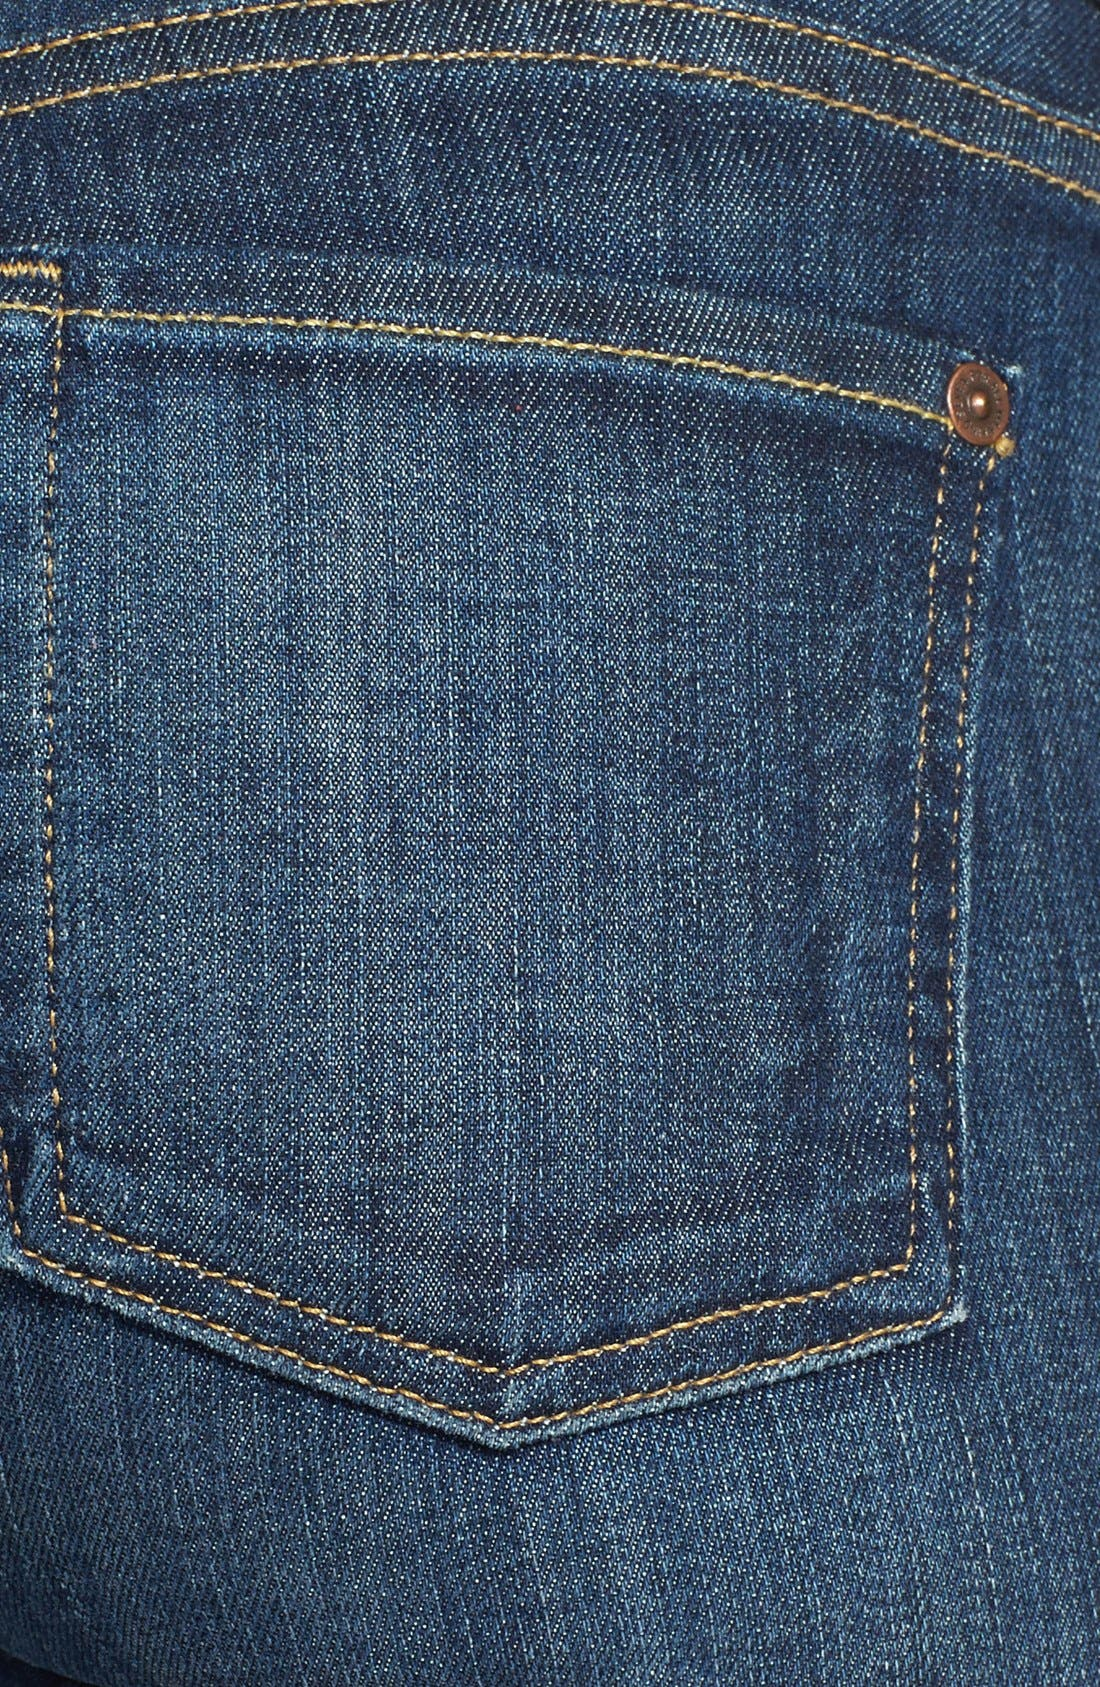 'The Skinny' Mid Rise Skinny Jeans,                             Alternate thumbnail 3, color,                             400